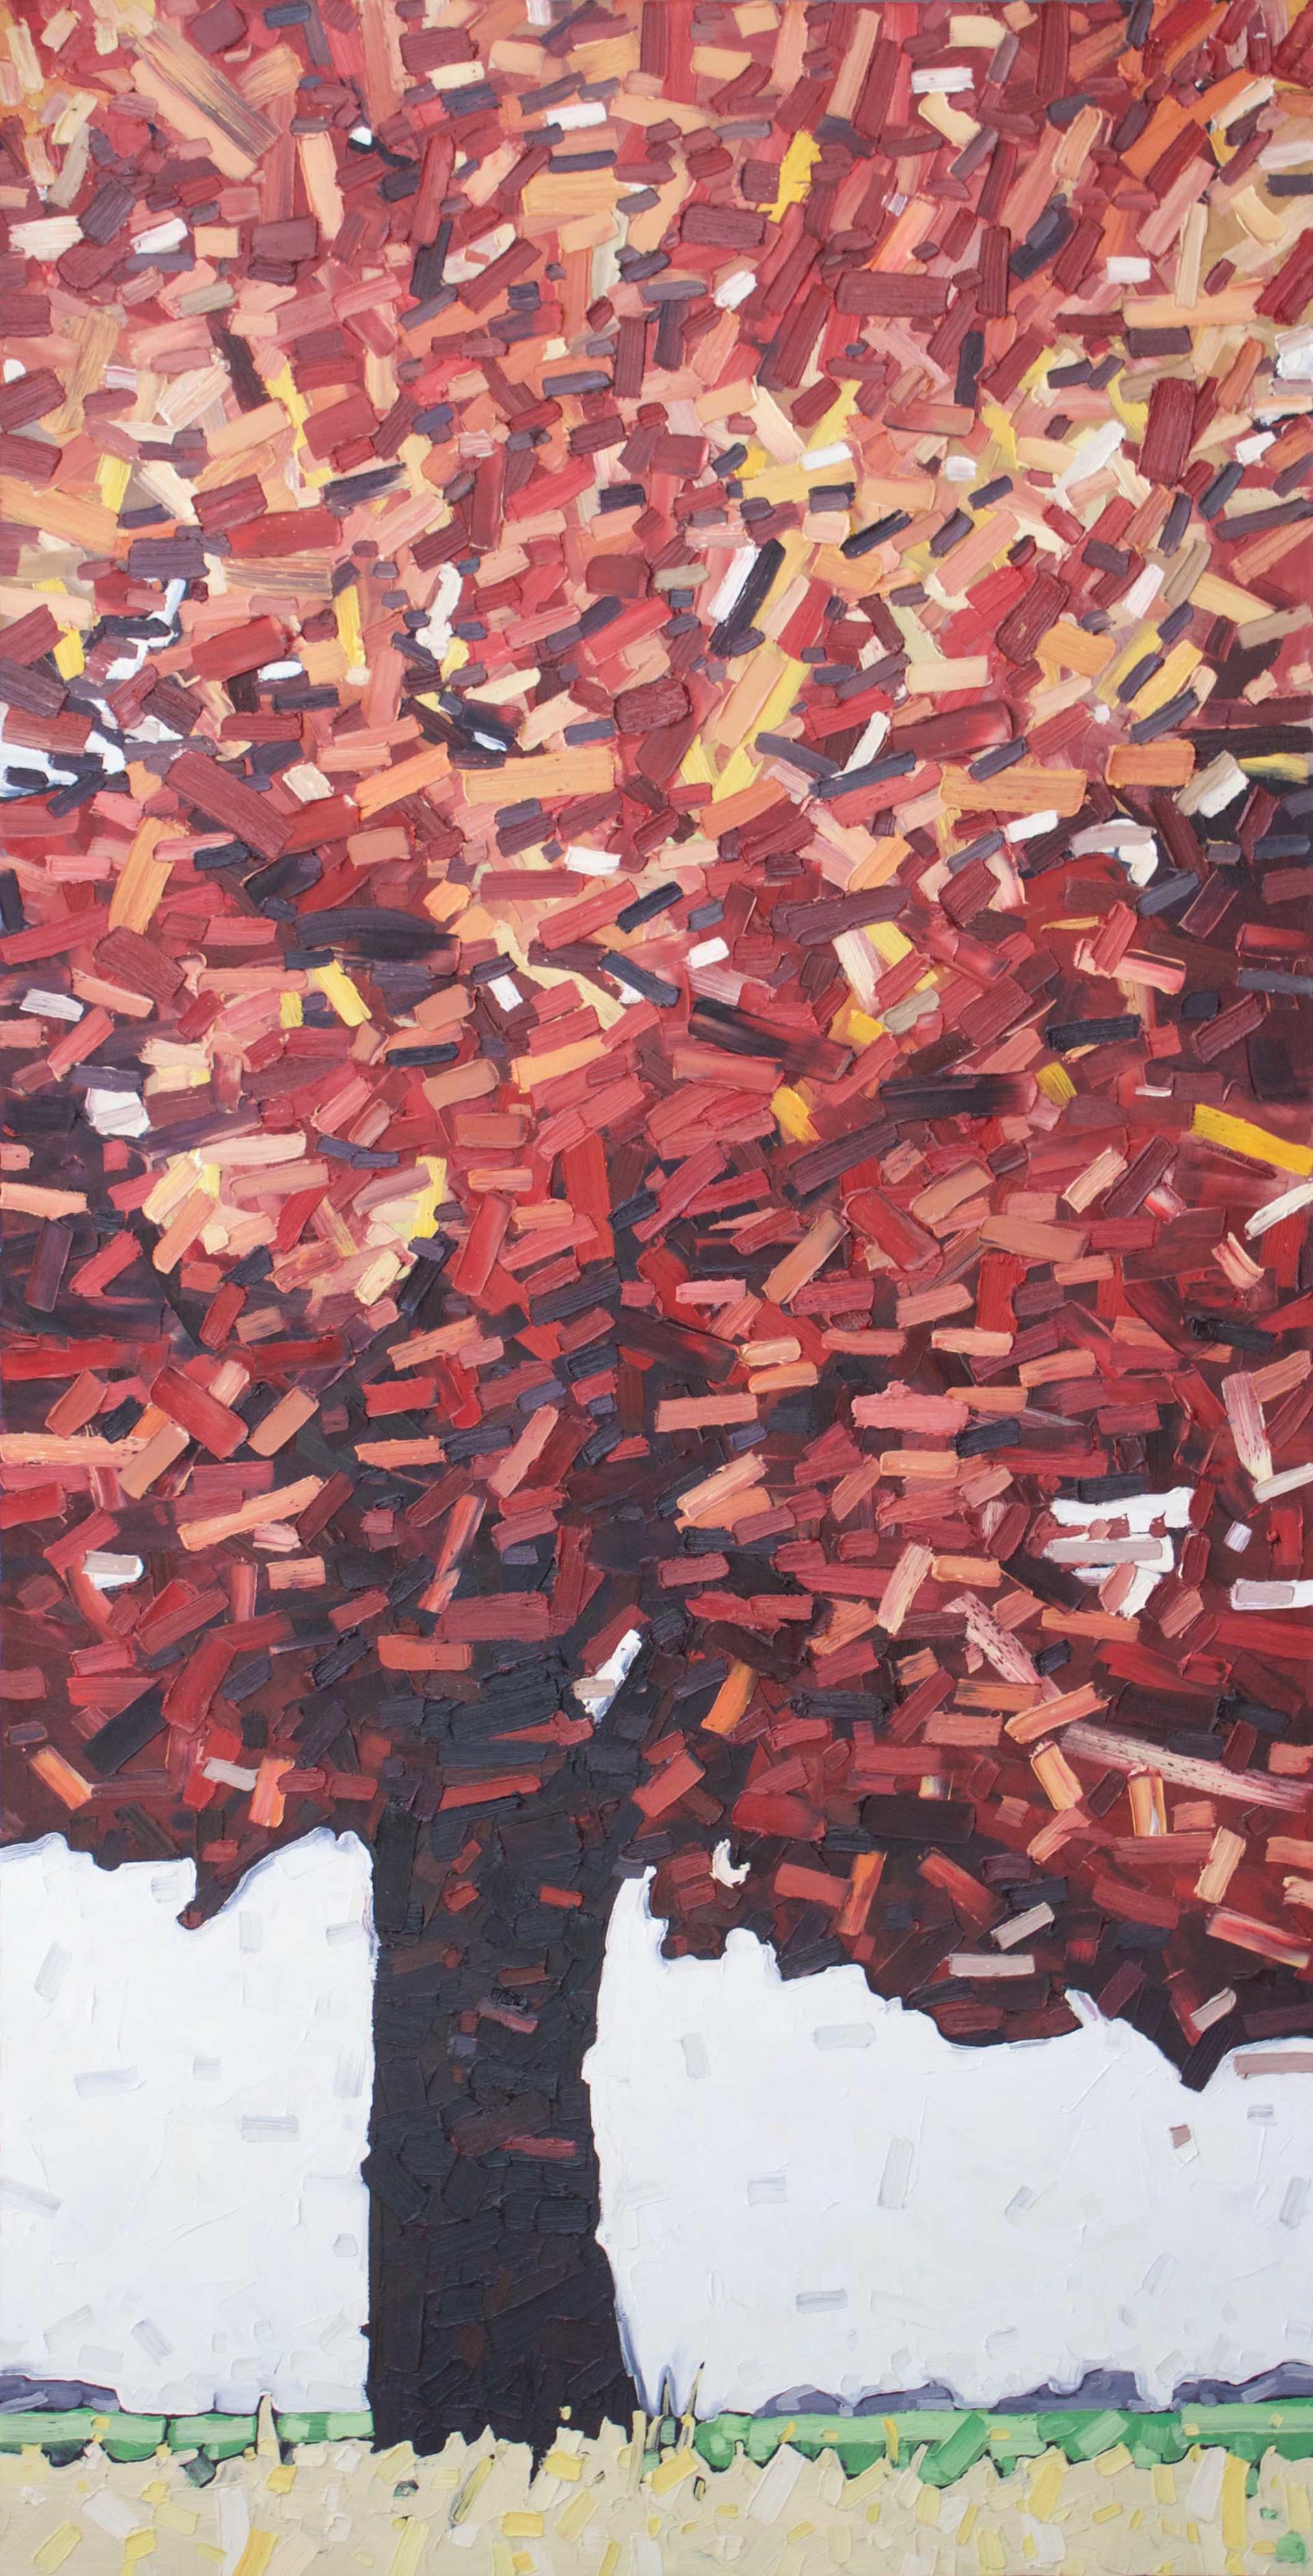 Fire Tree by David Grieve